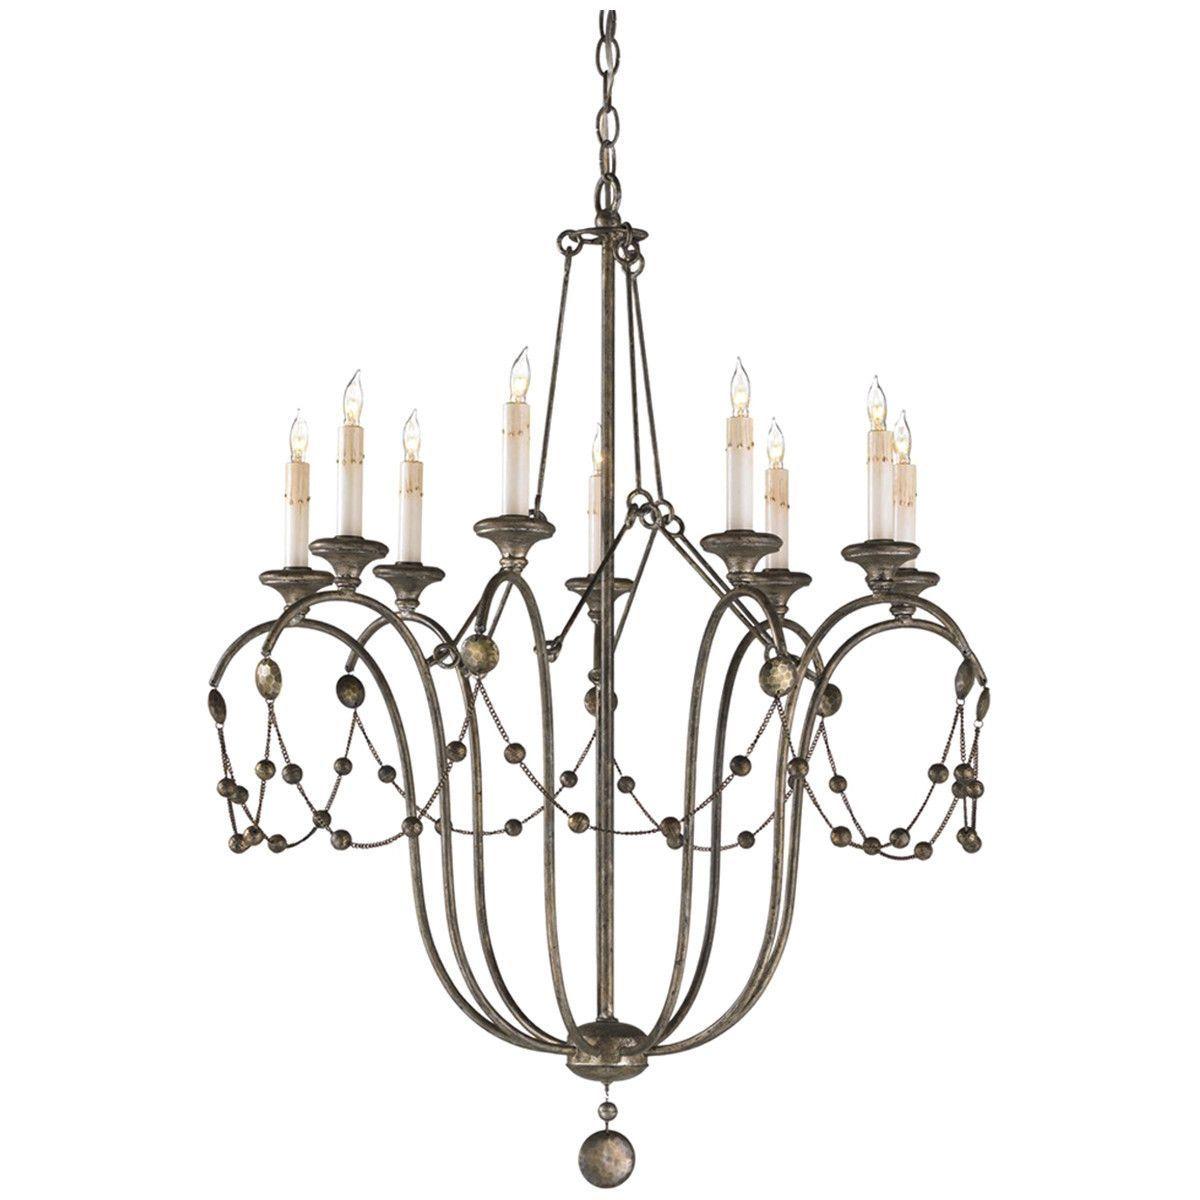 Arteriors devon chandelier products pinterest devon and products arteriors devon chandelier arubaitofo Images